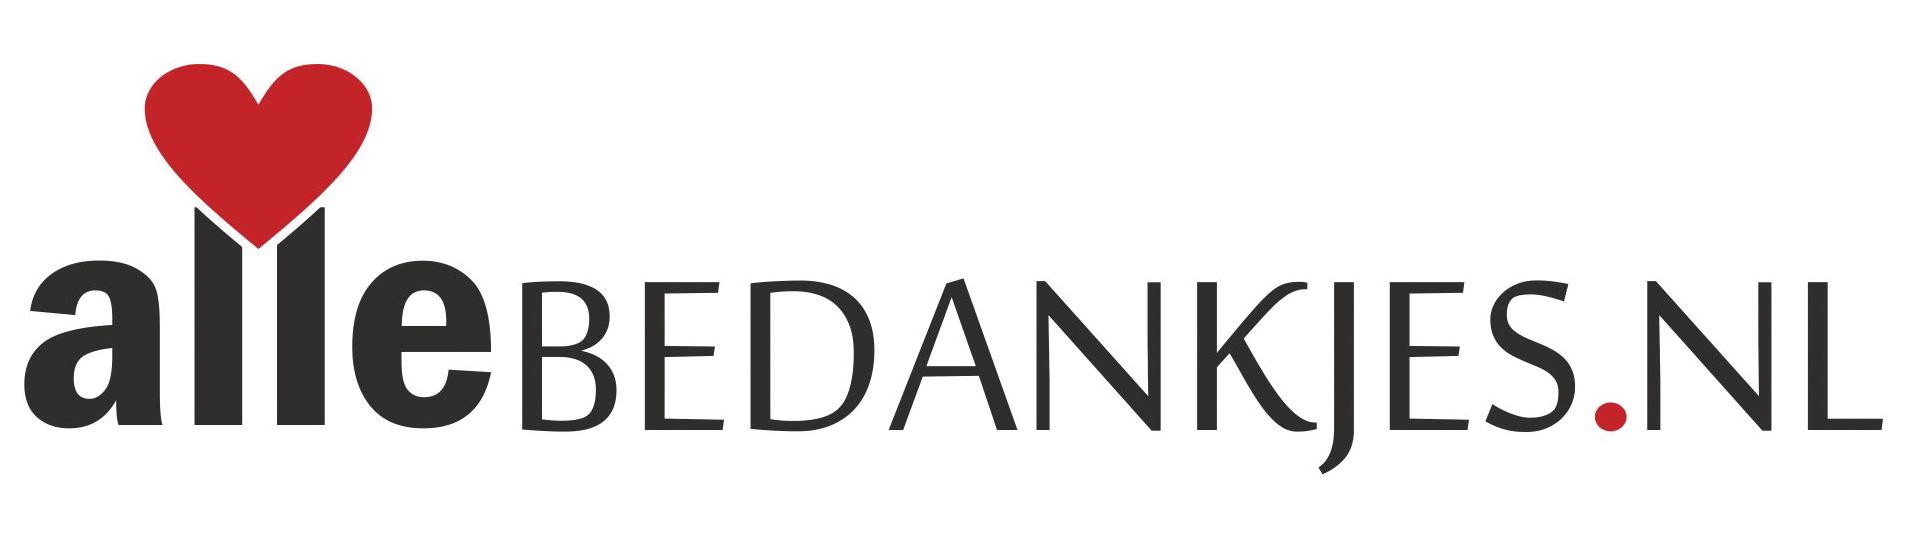 Allebedankjes.nl & Knipkledingreparatie